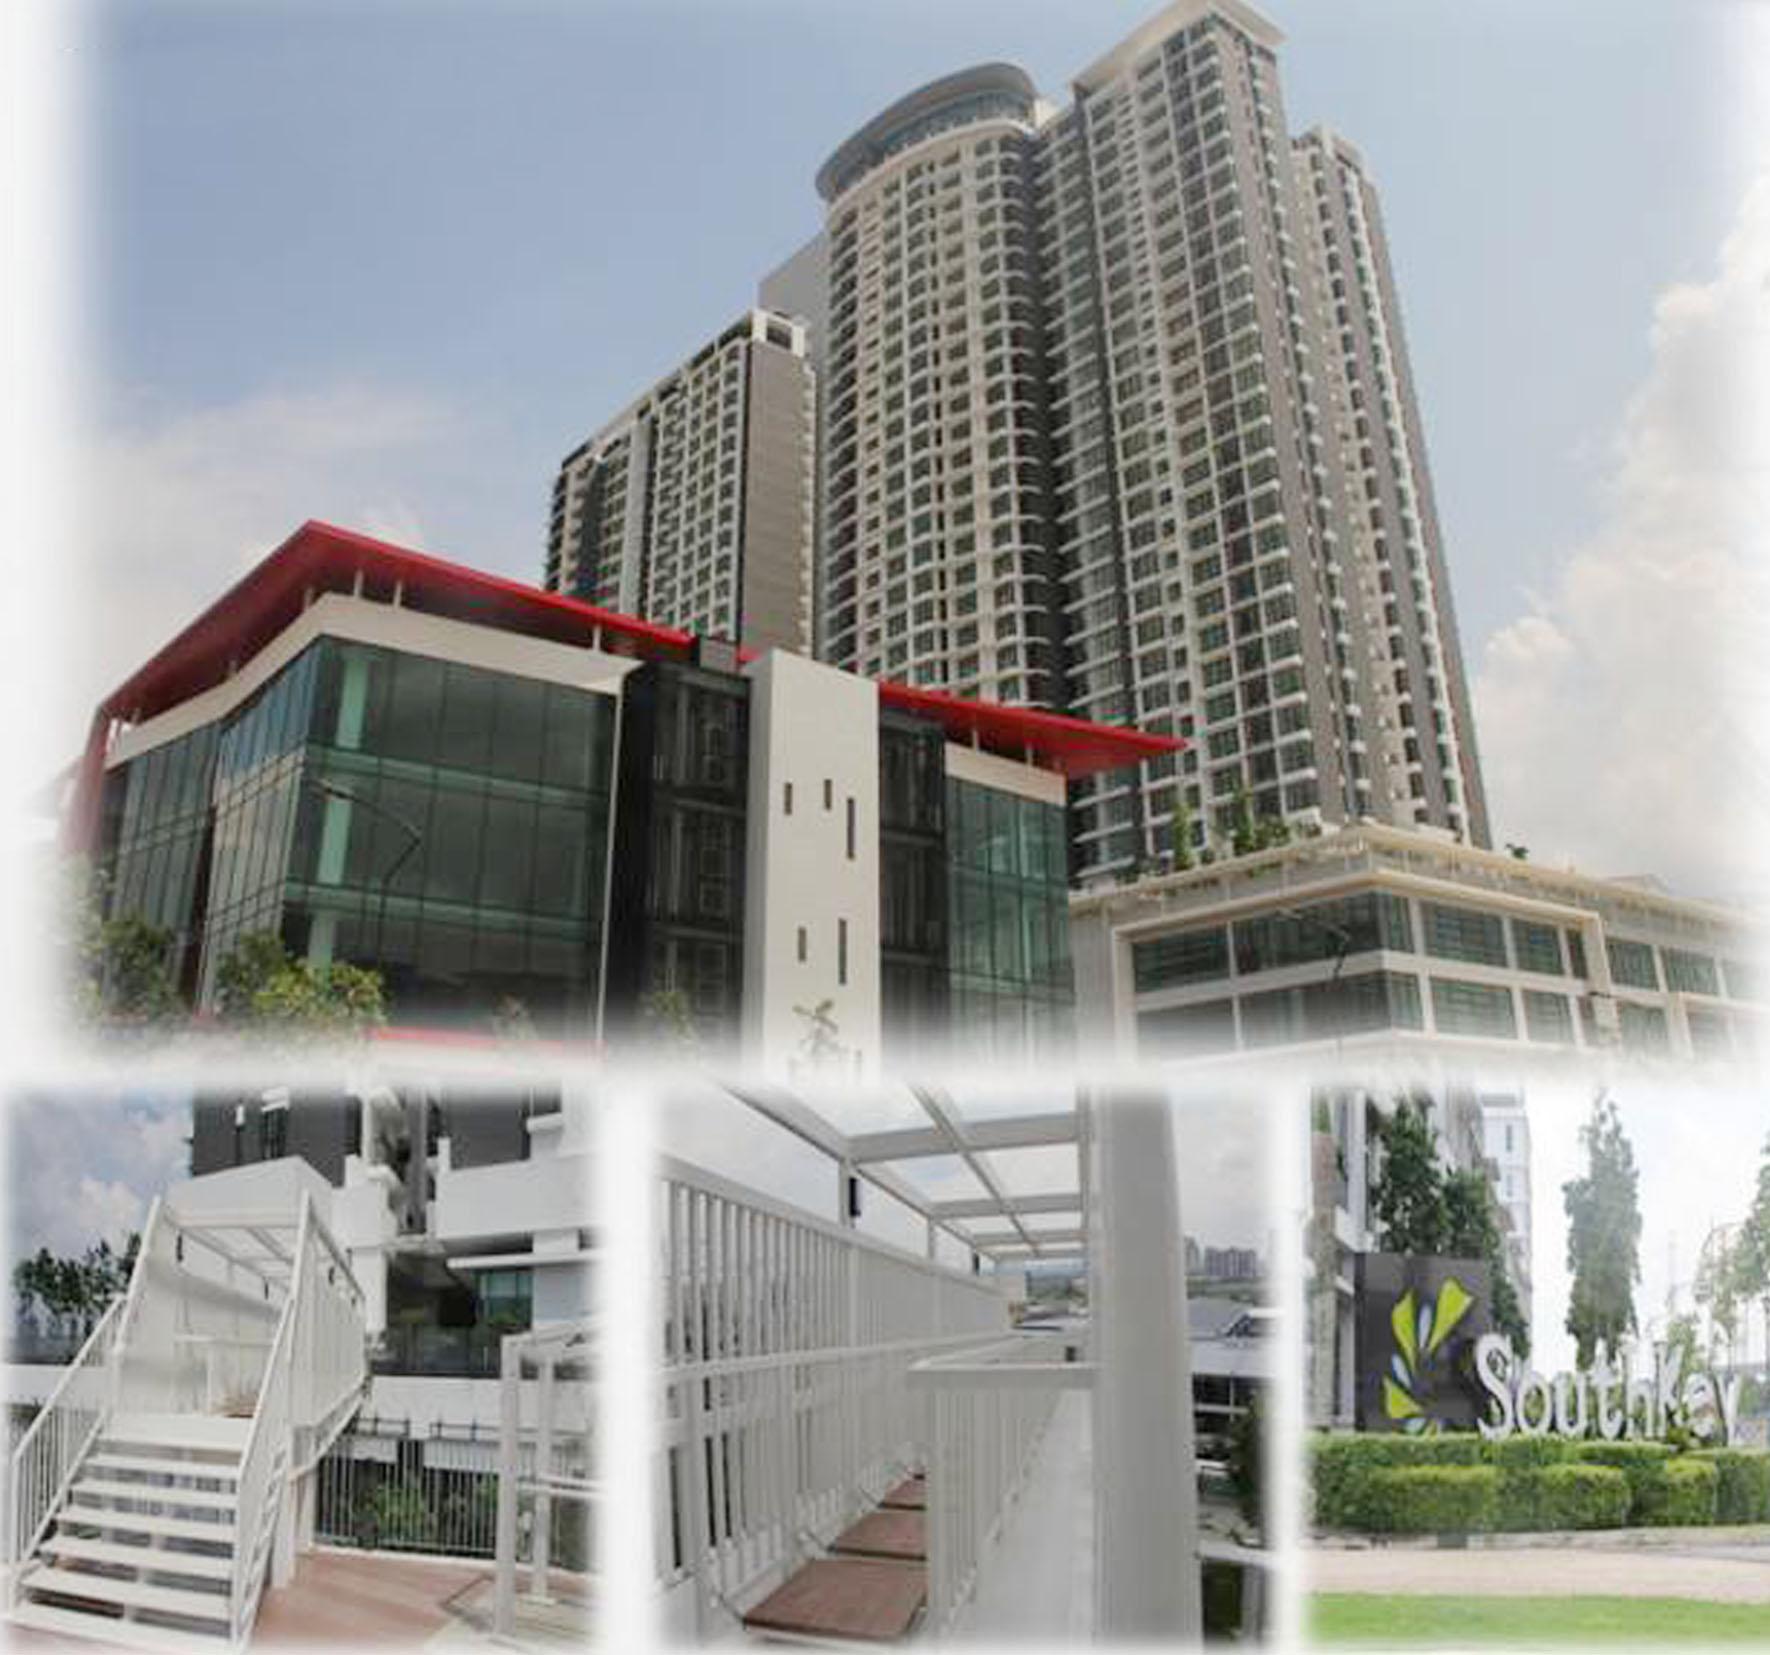 Southkey Mosaic Johor